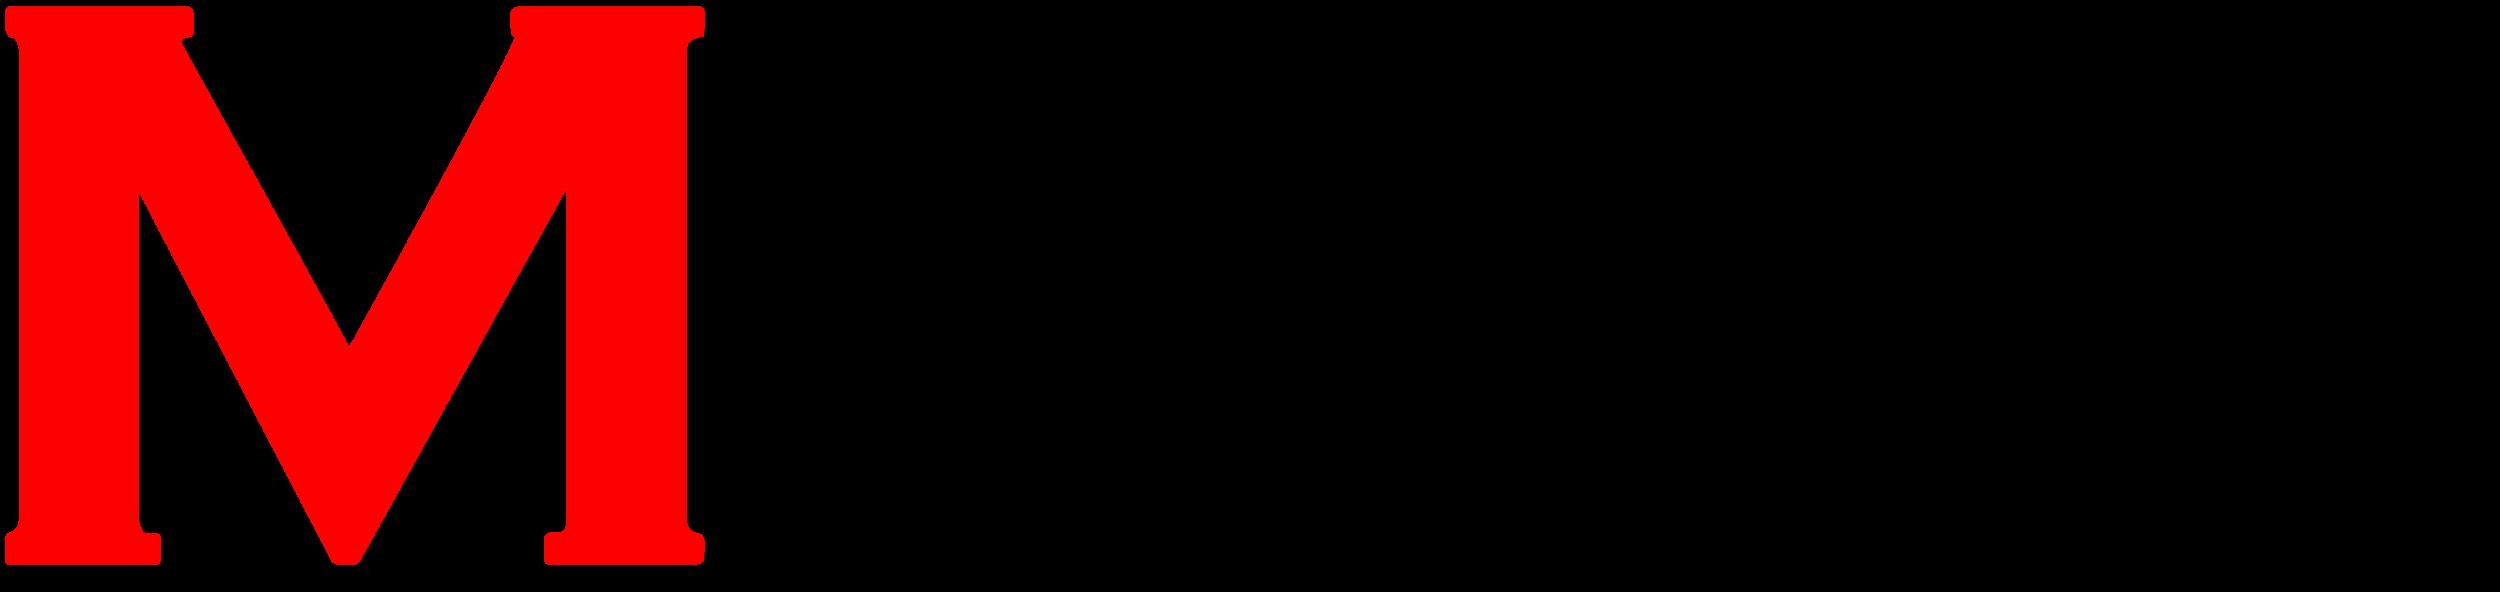 morphe-logo.png